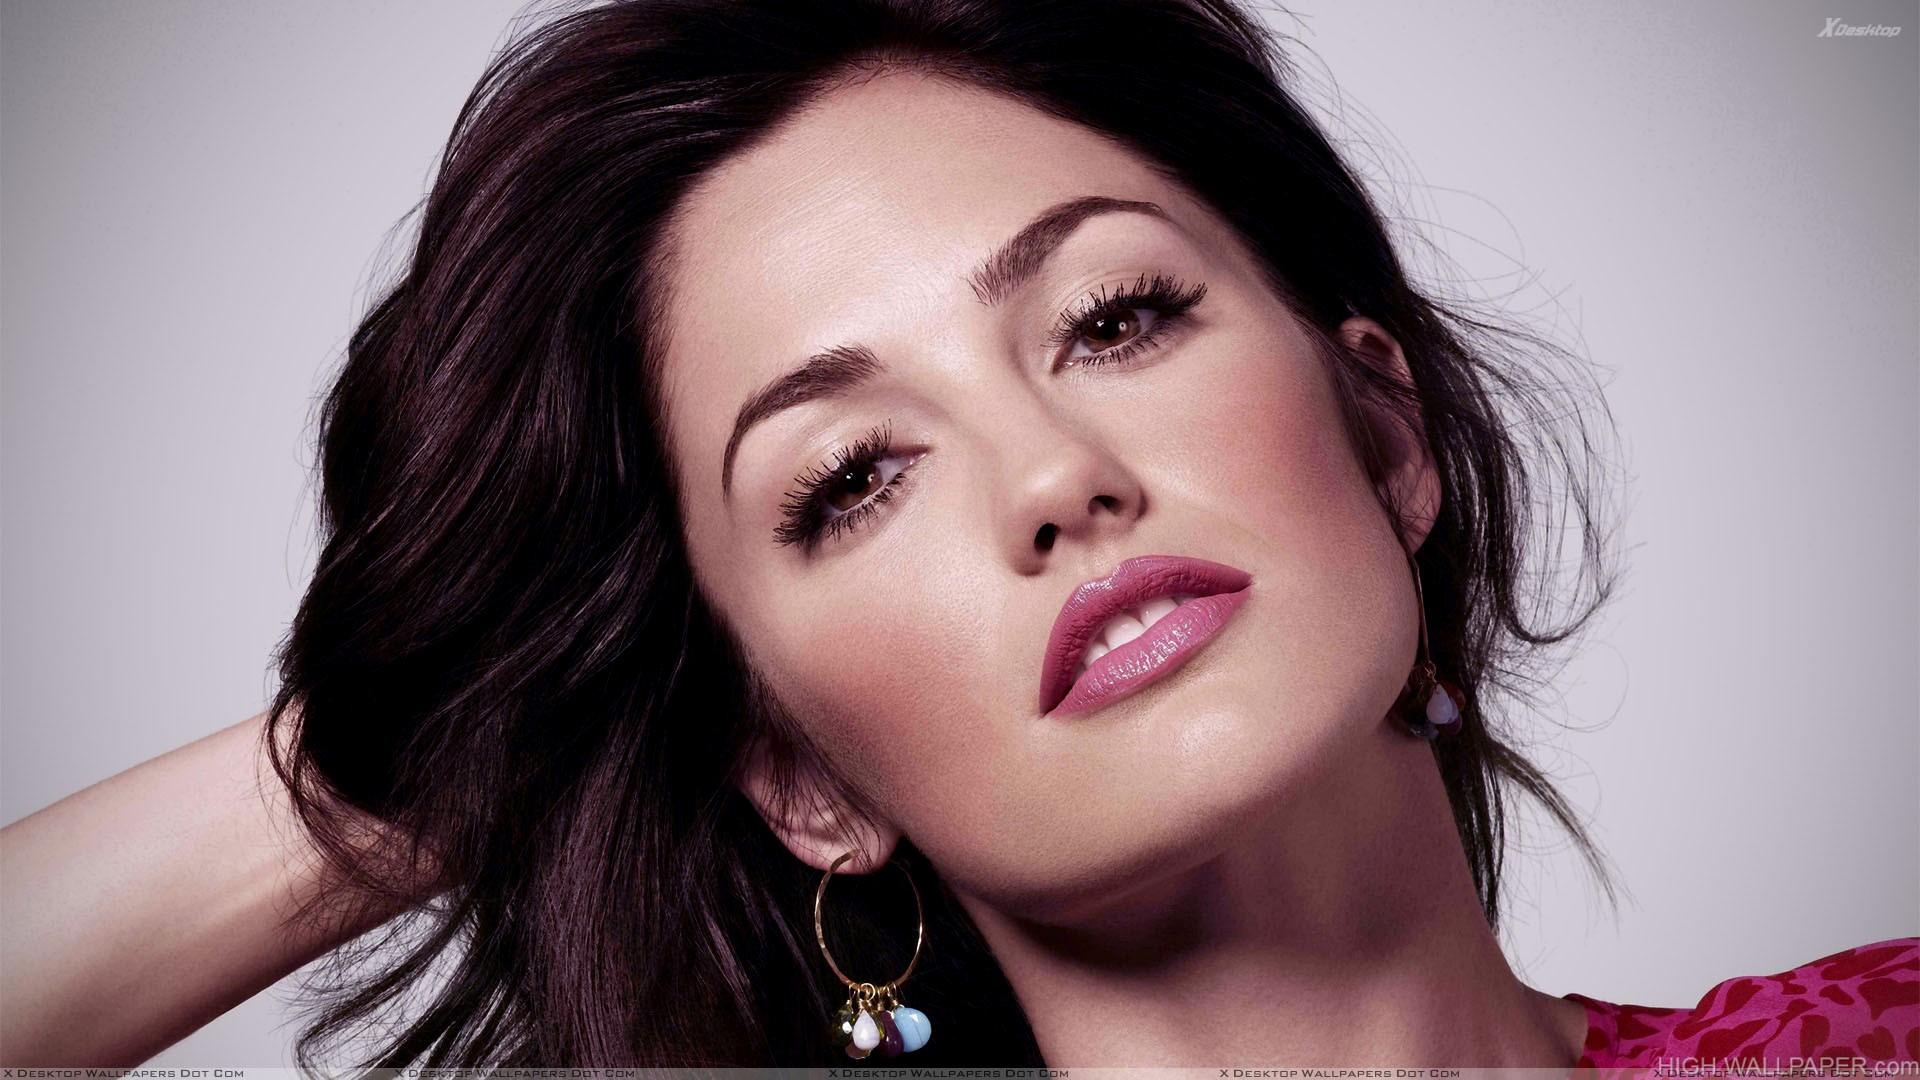 Minka Kelly Pink Lips And Sexy Face Photoshoot